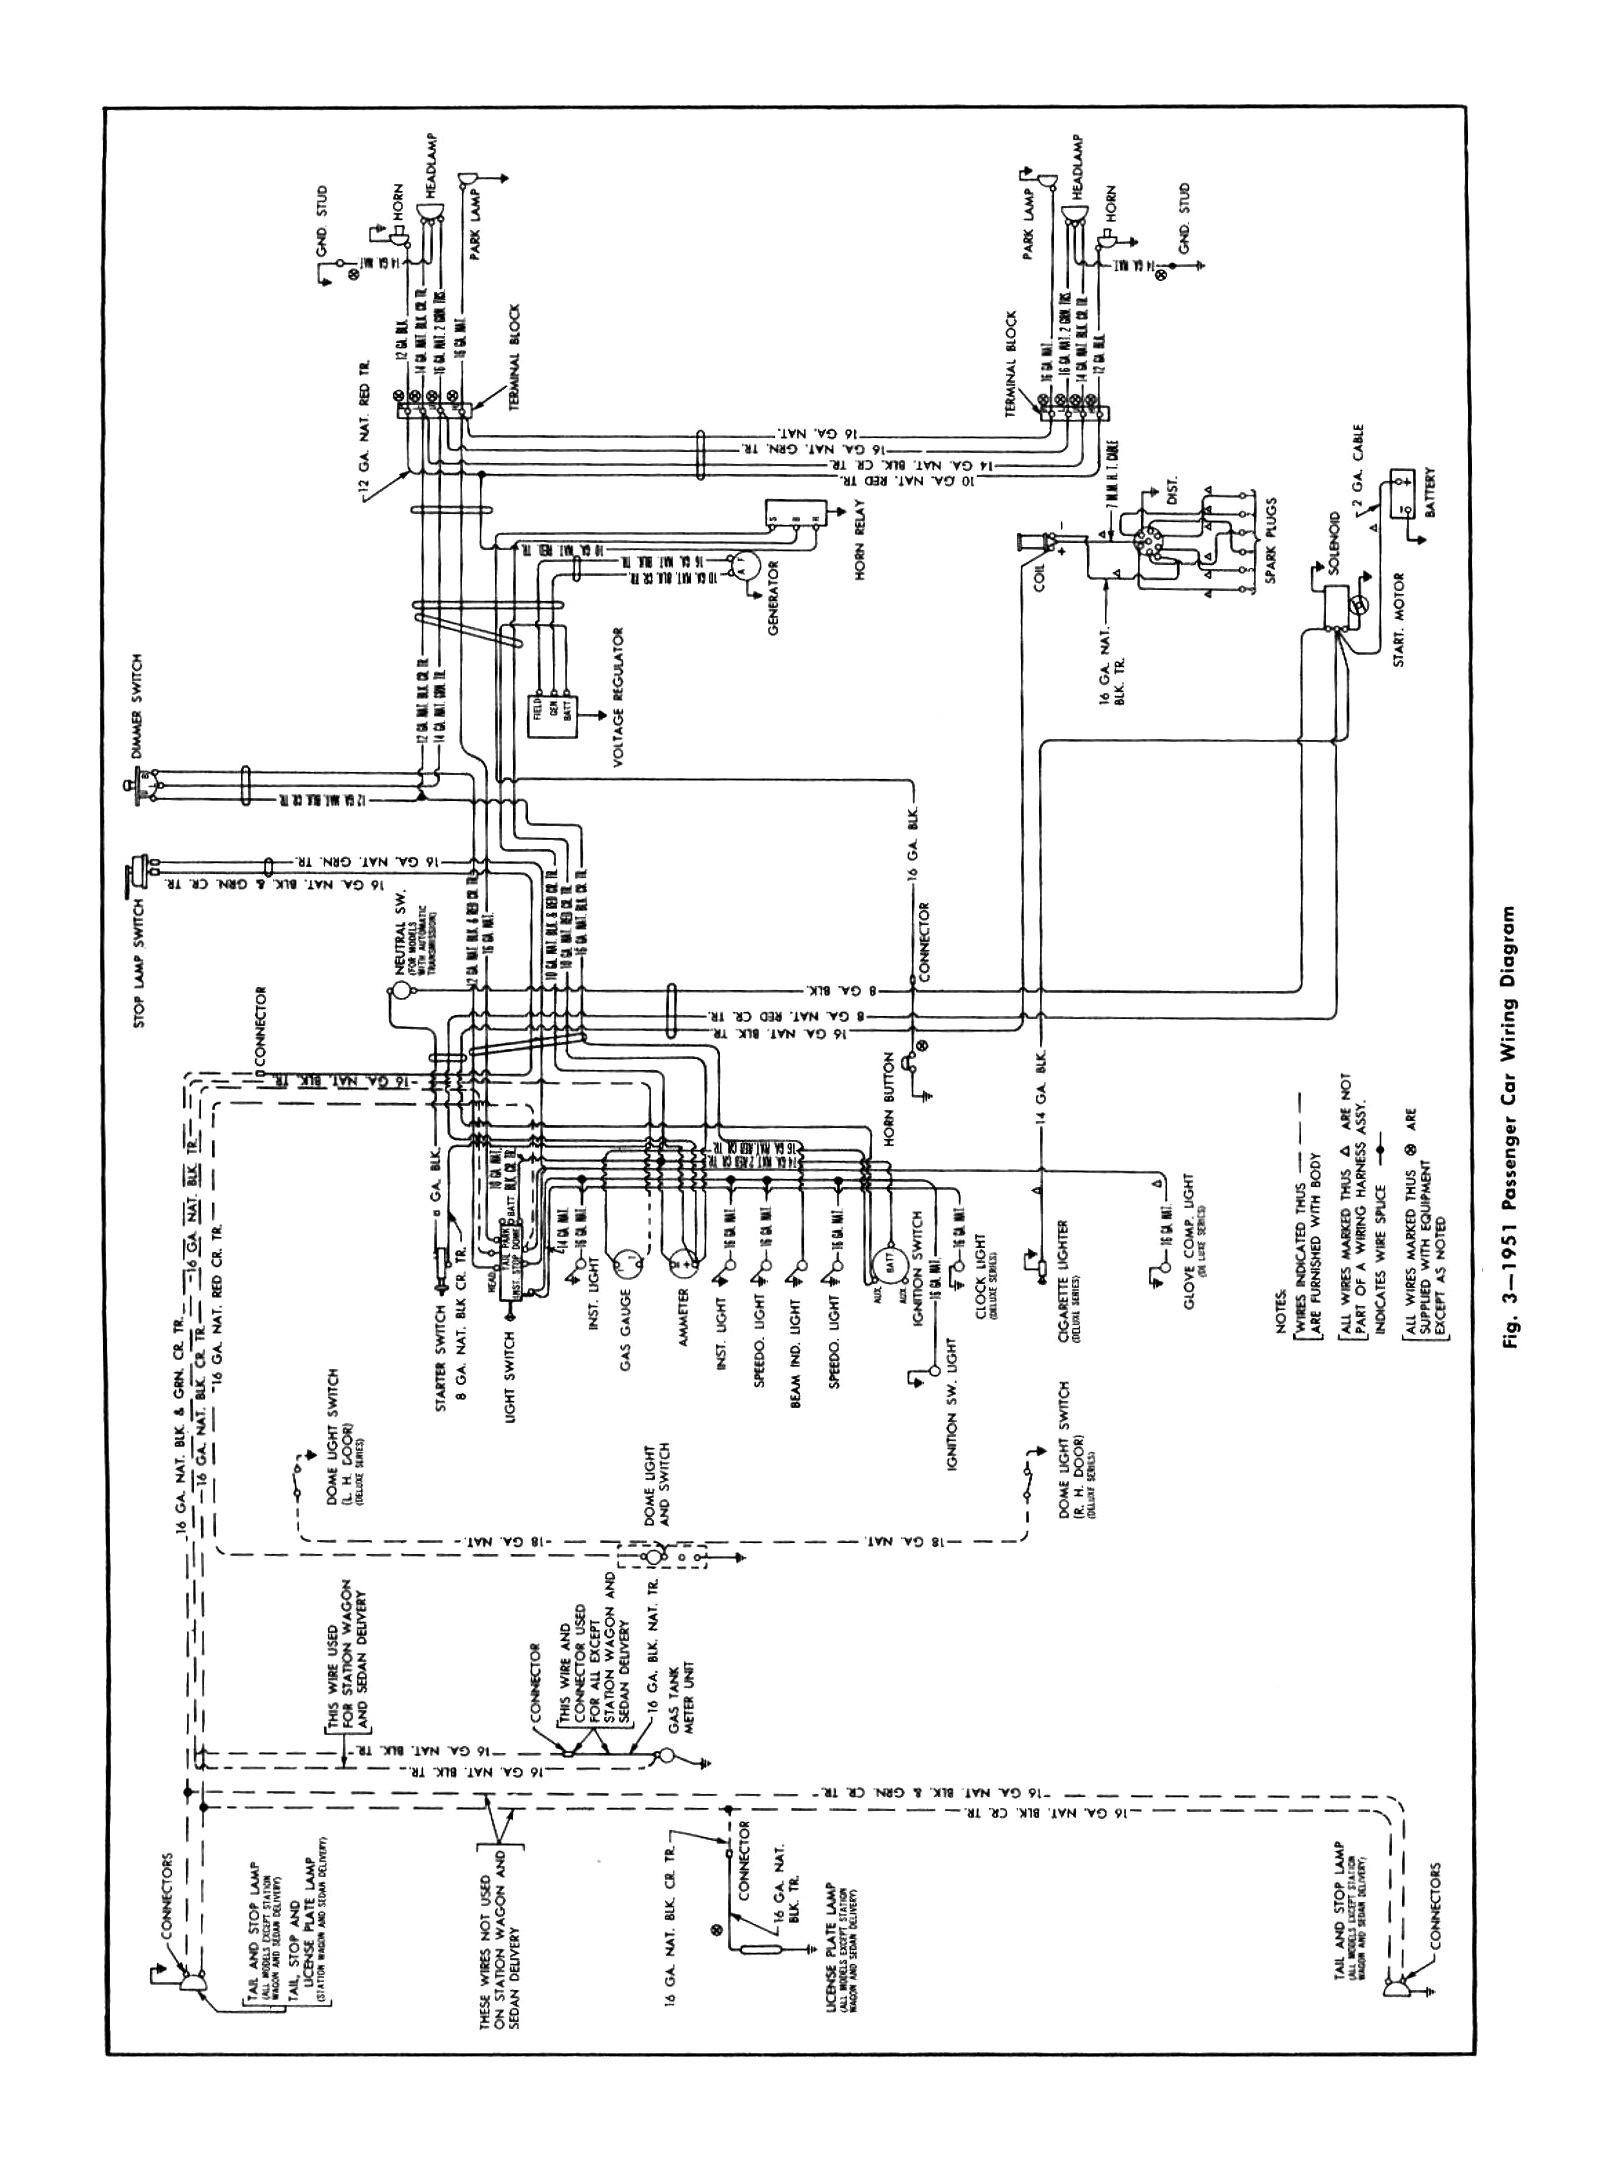 1988 Electric Club Car Schematic | Wiring Diagram Image